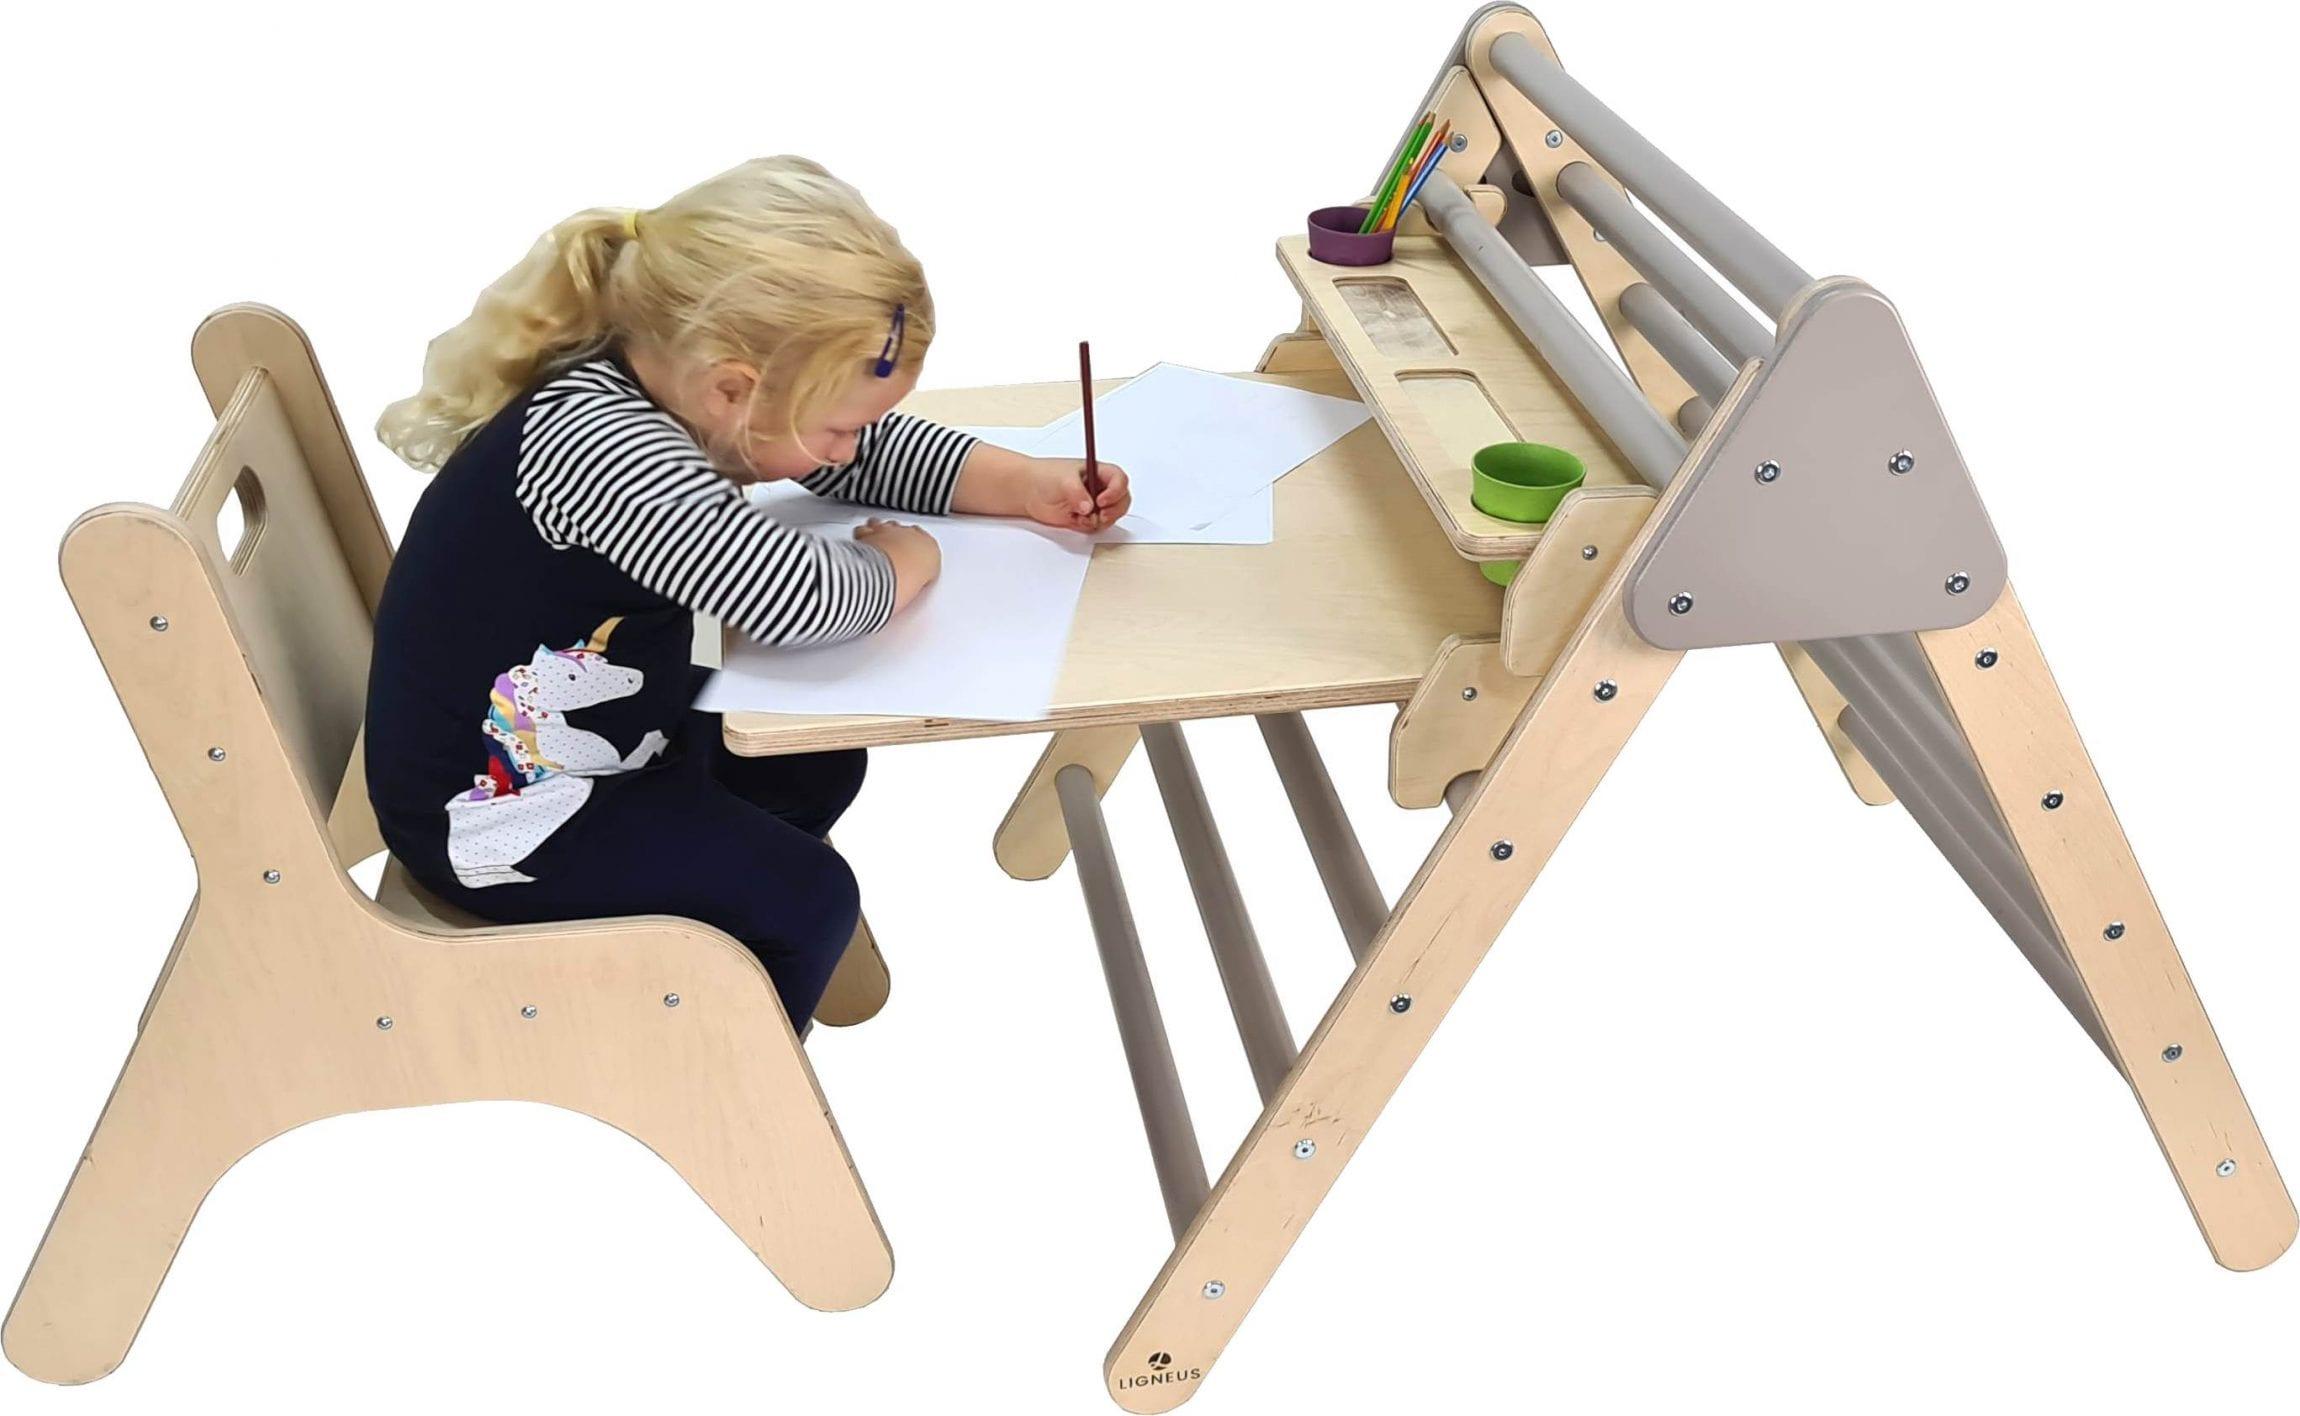 Thea drawing at Junior Pikler Desk Set Gretton Grey